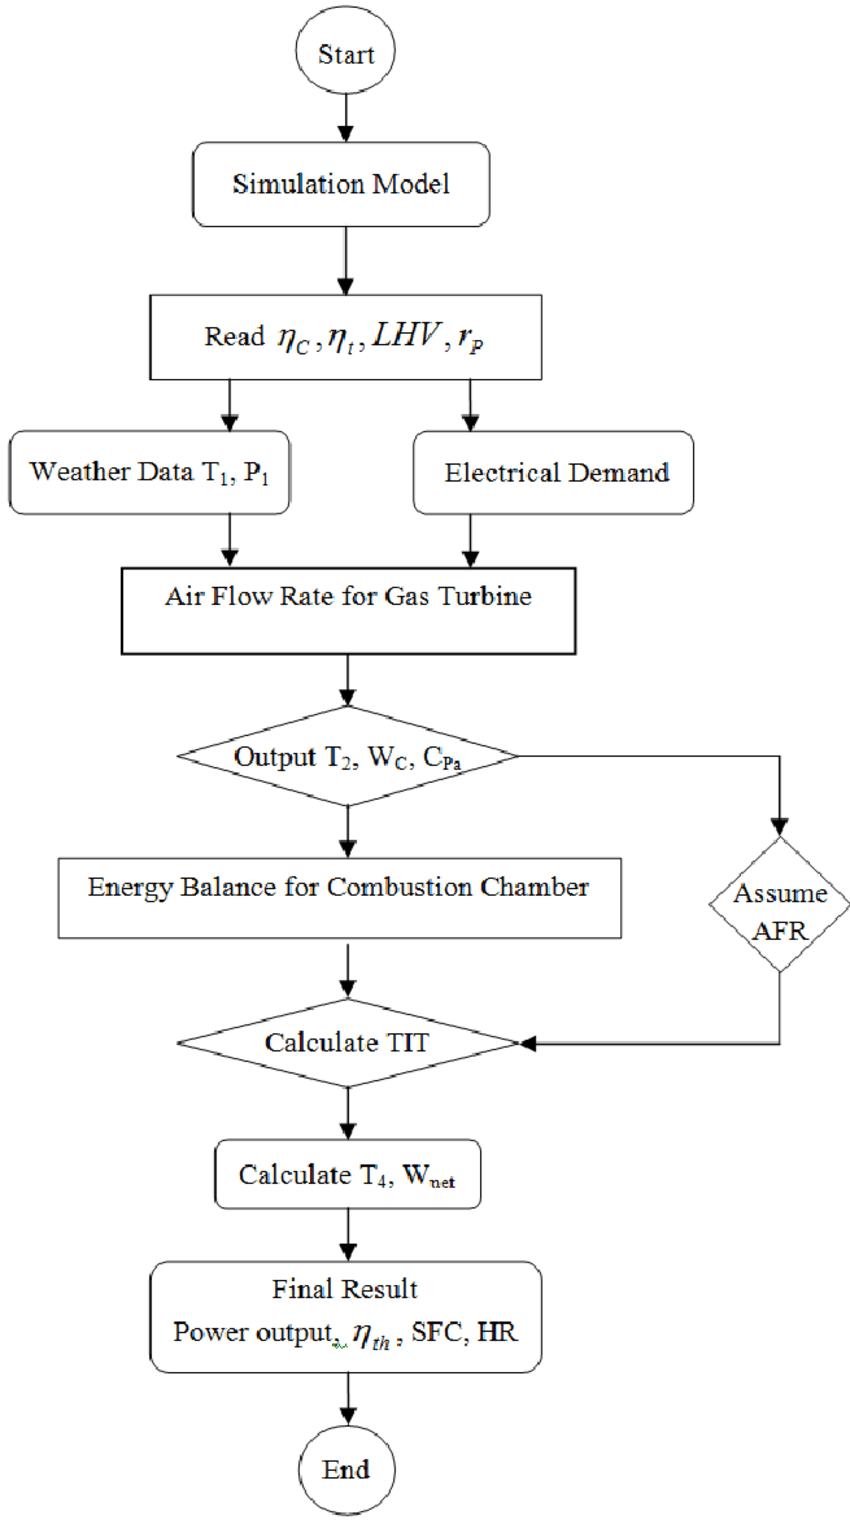 medium resolution of flowchart of simulation of performance process for simple gas turbine power plant